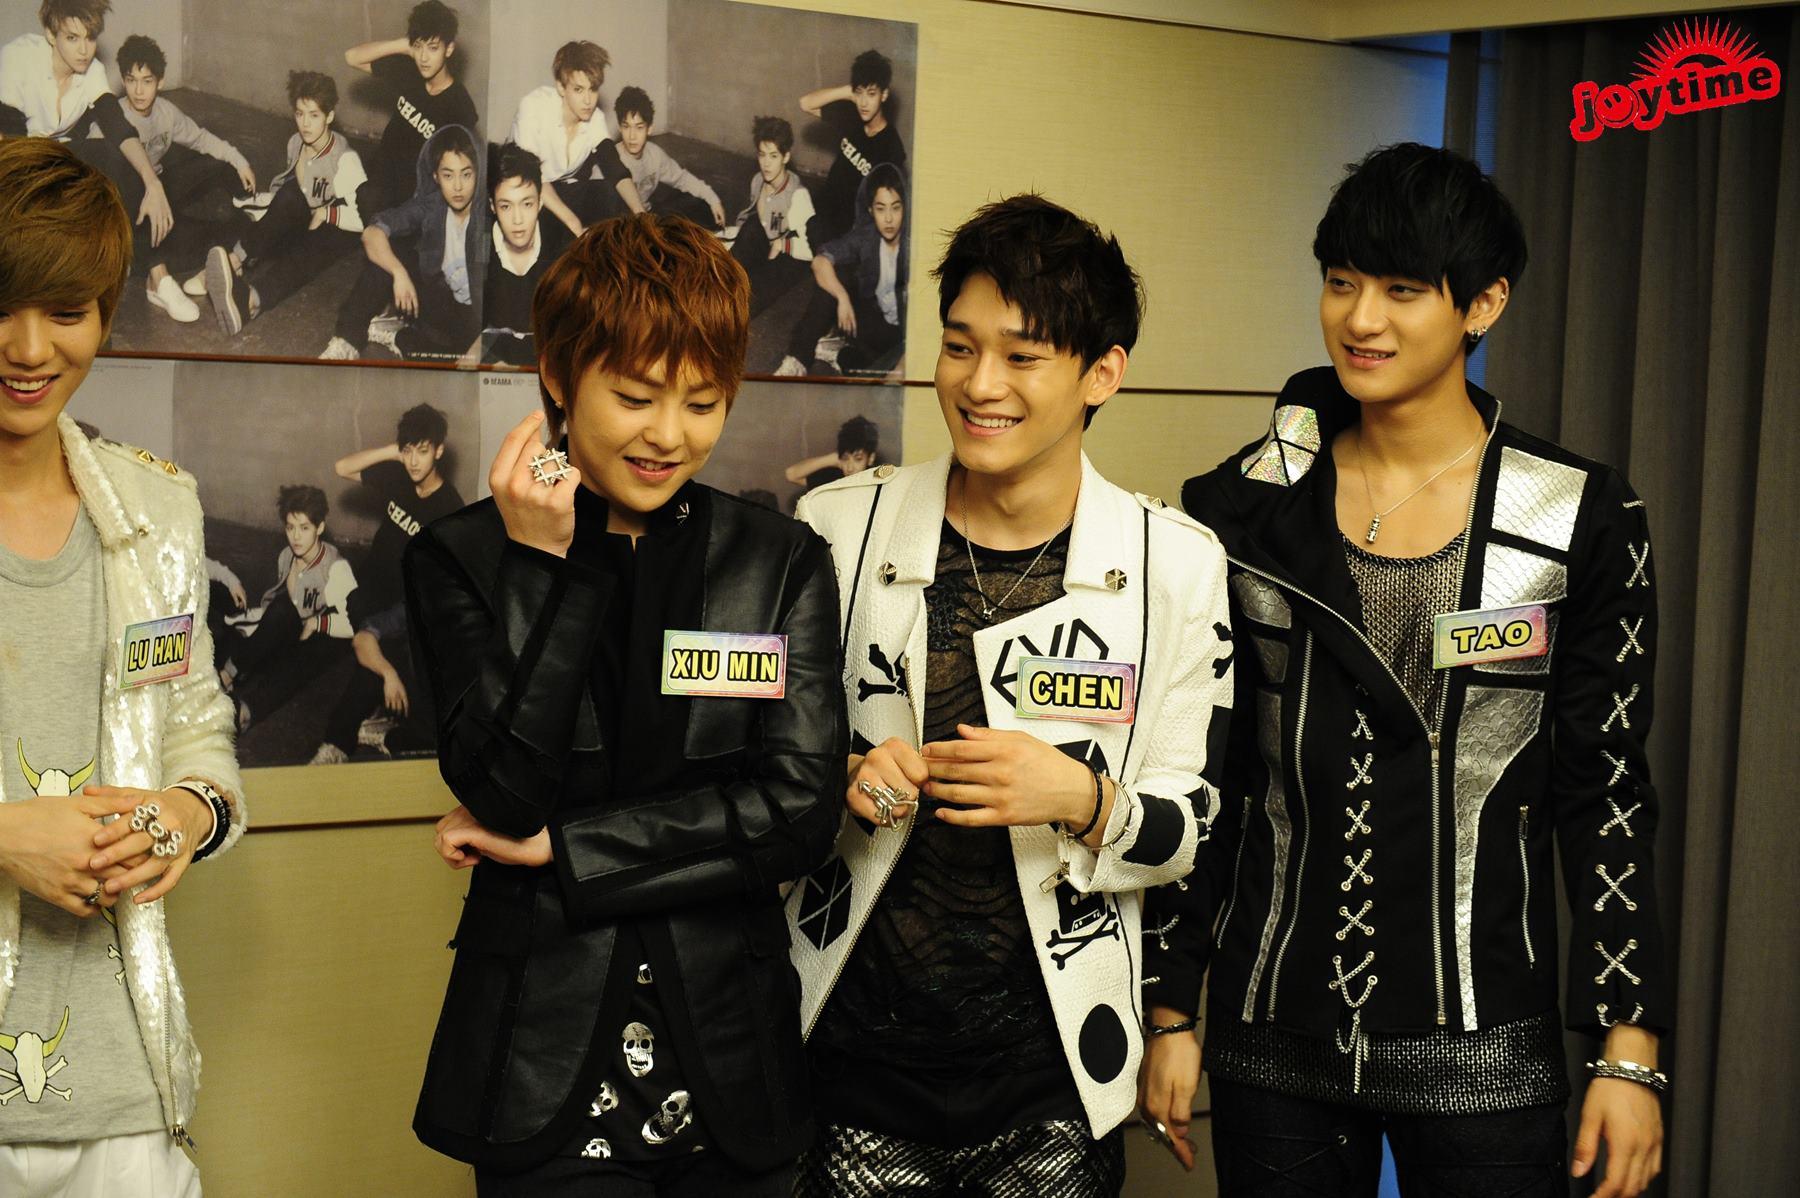 EXO-M for 100% Entertainment